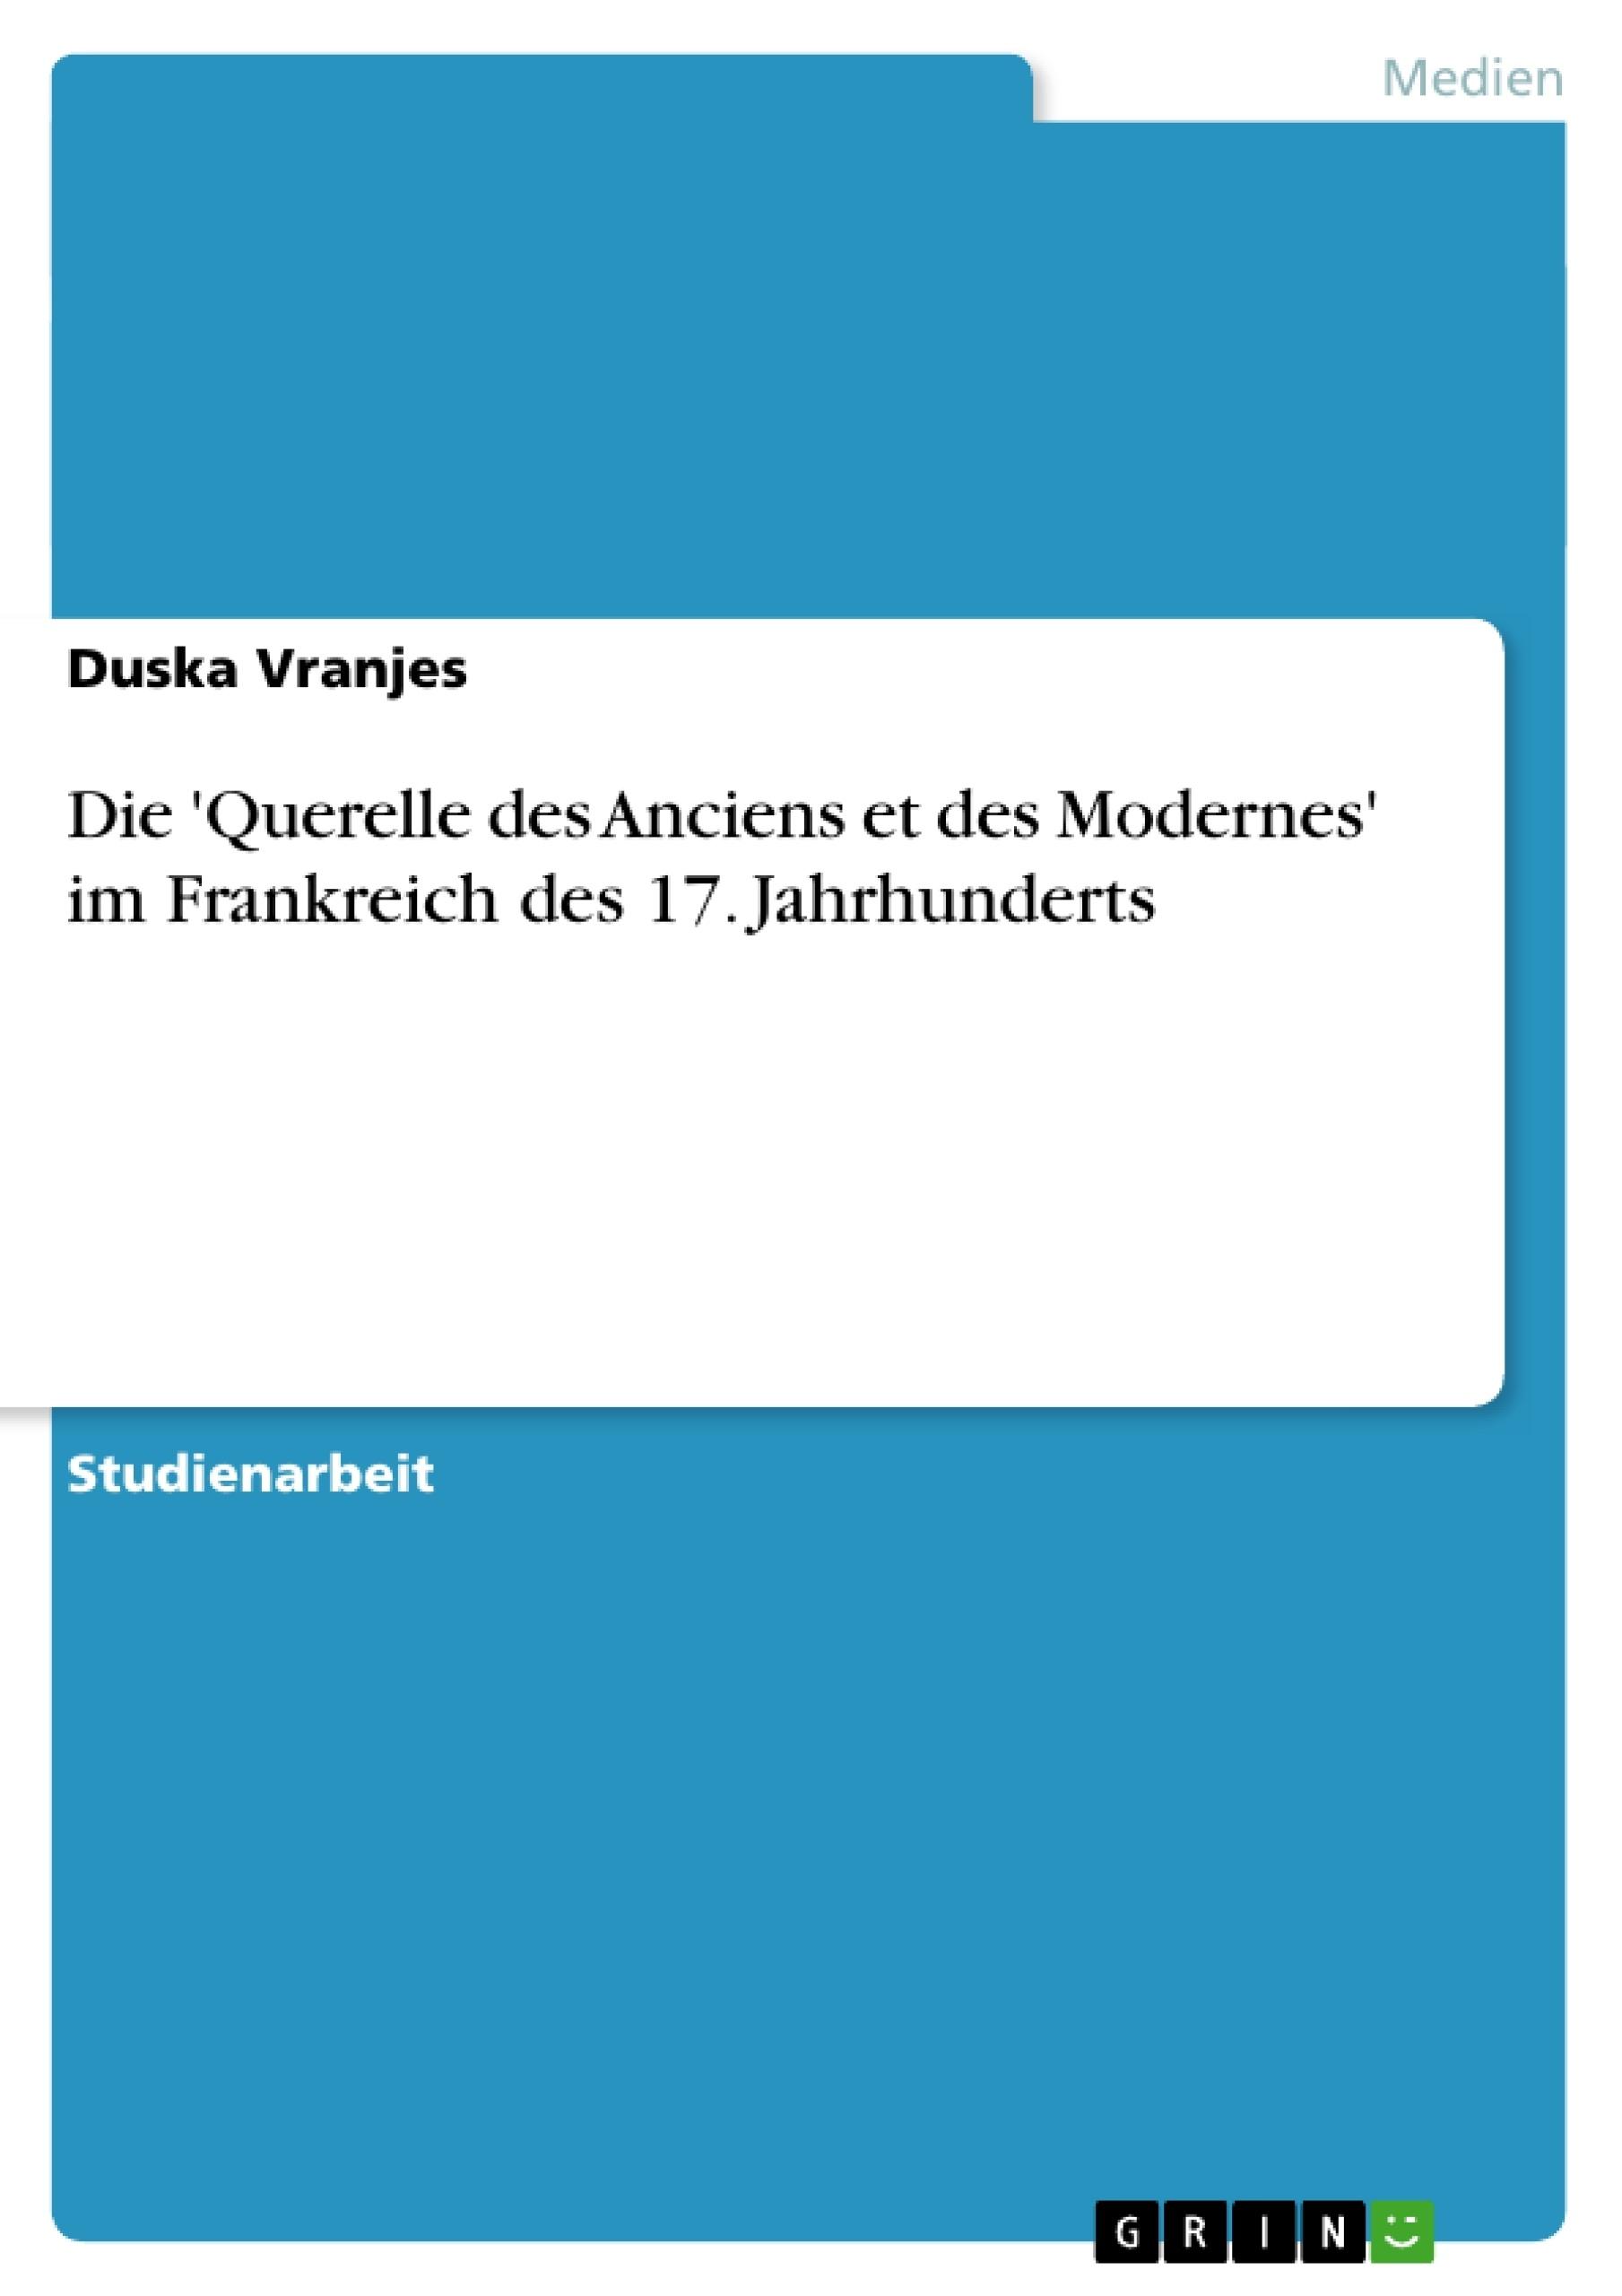 Titel: Die 'Querelle des Anciens et des Modernes' im Frankreich des  17. Jahrhunderts